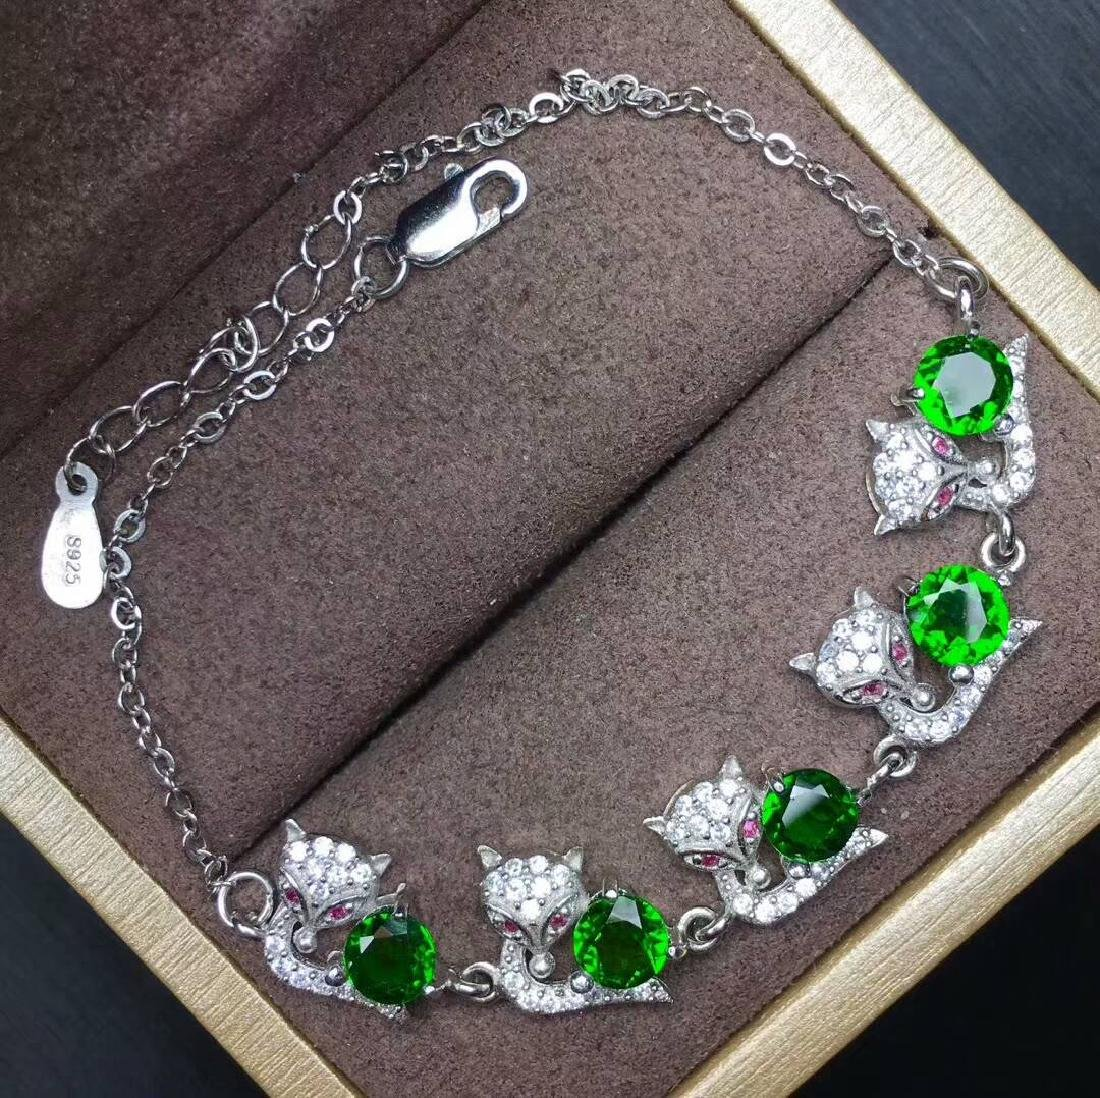 4ct Diopside Bracelets in 925 Silver